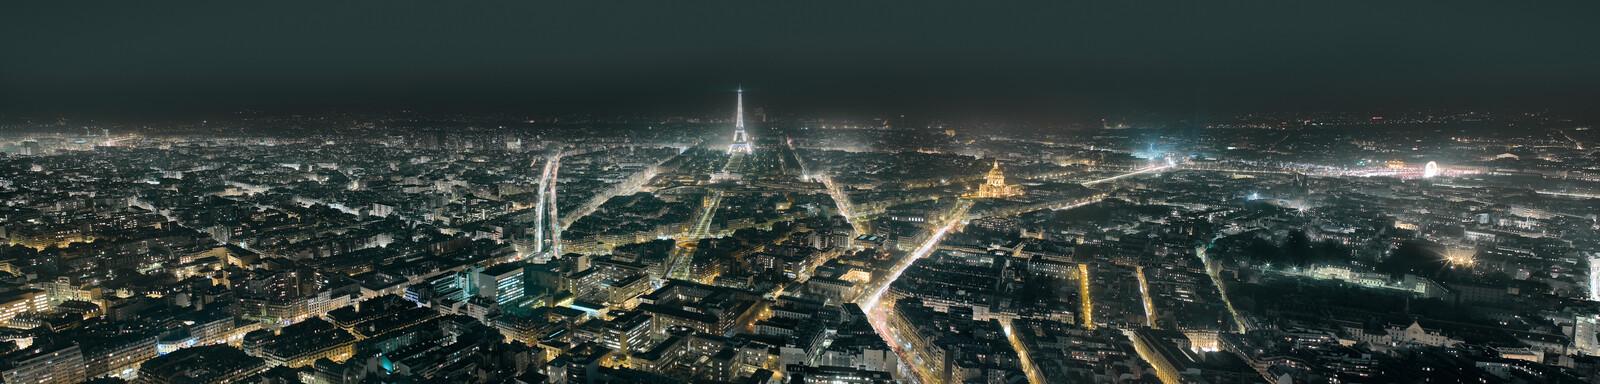 Paris 1 - Christian Stoll